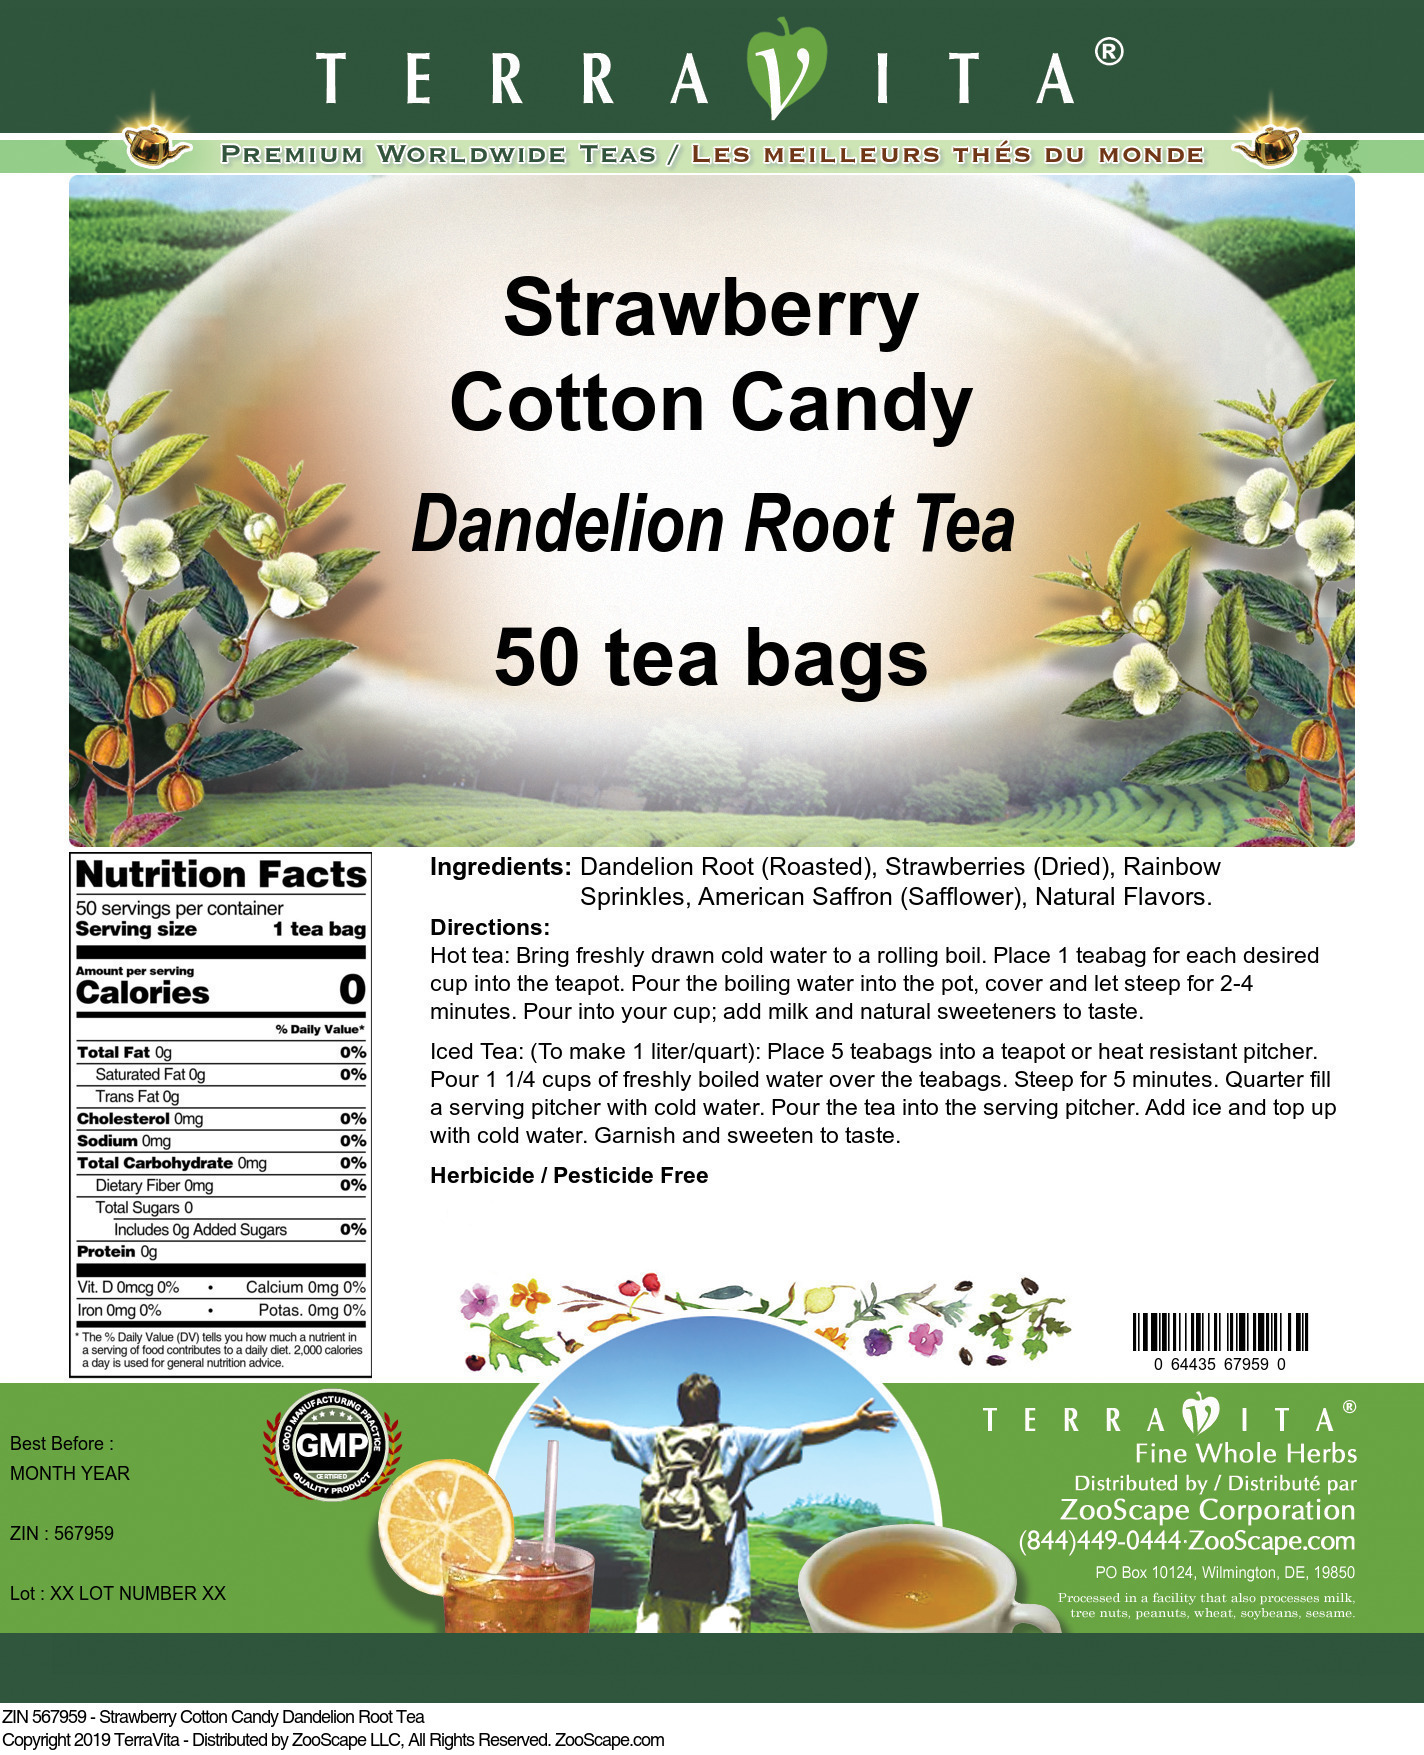 Strawberry Cotton Candy Dandelion Root Tea